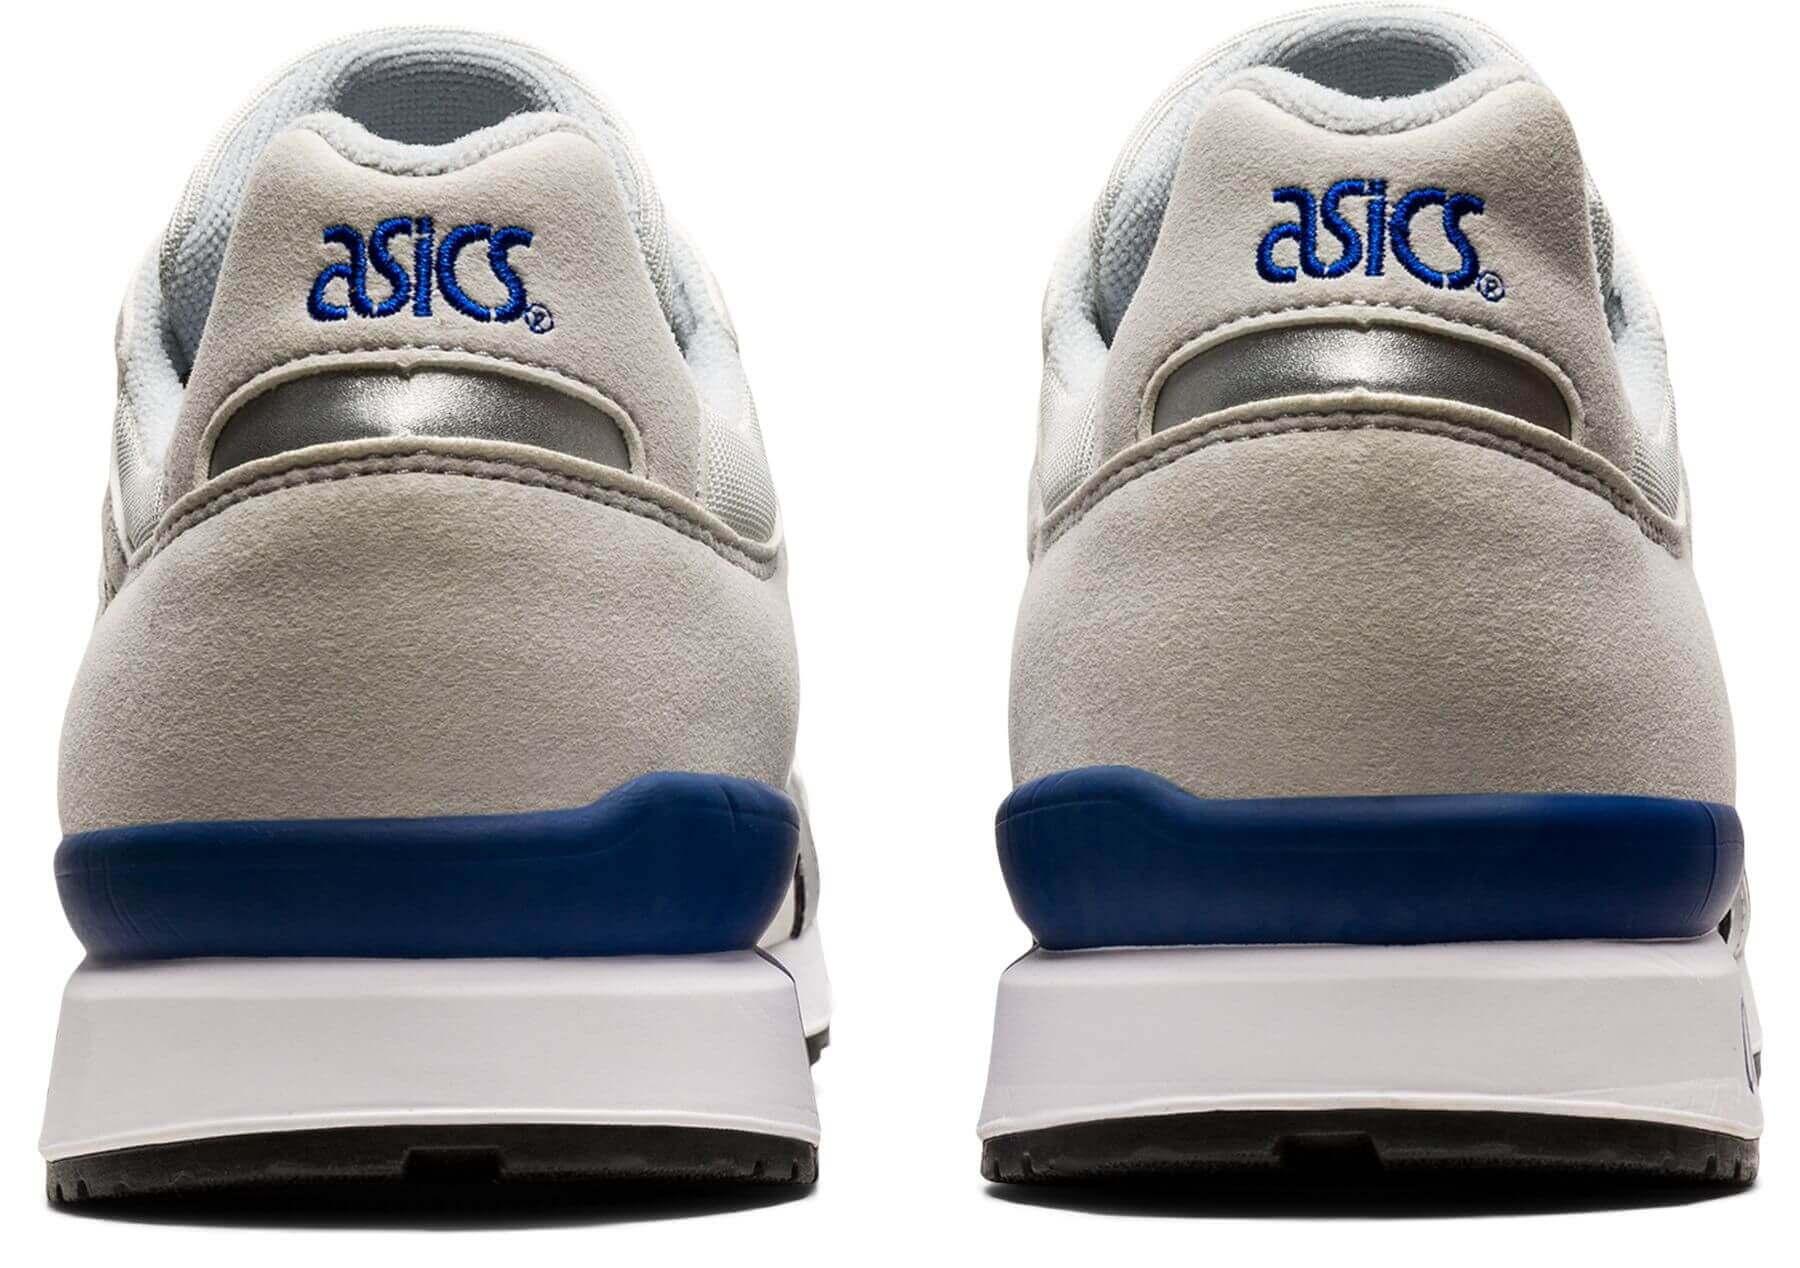 ASICSSportStyle - GT-II - glacier grey/asics blue - 1201A253-035